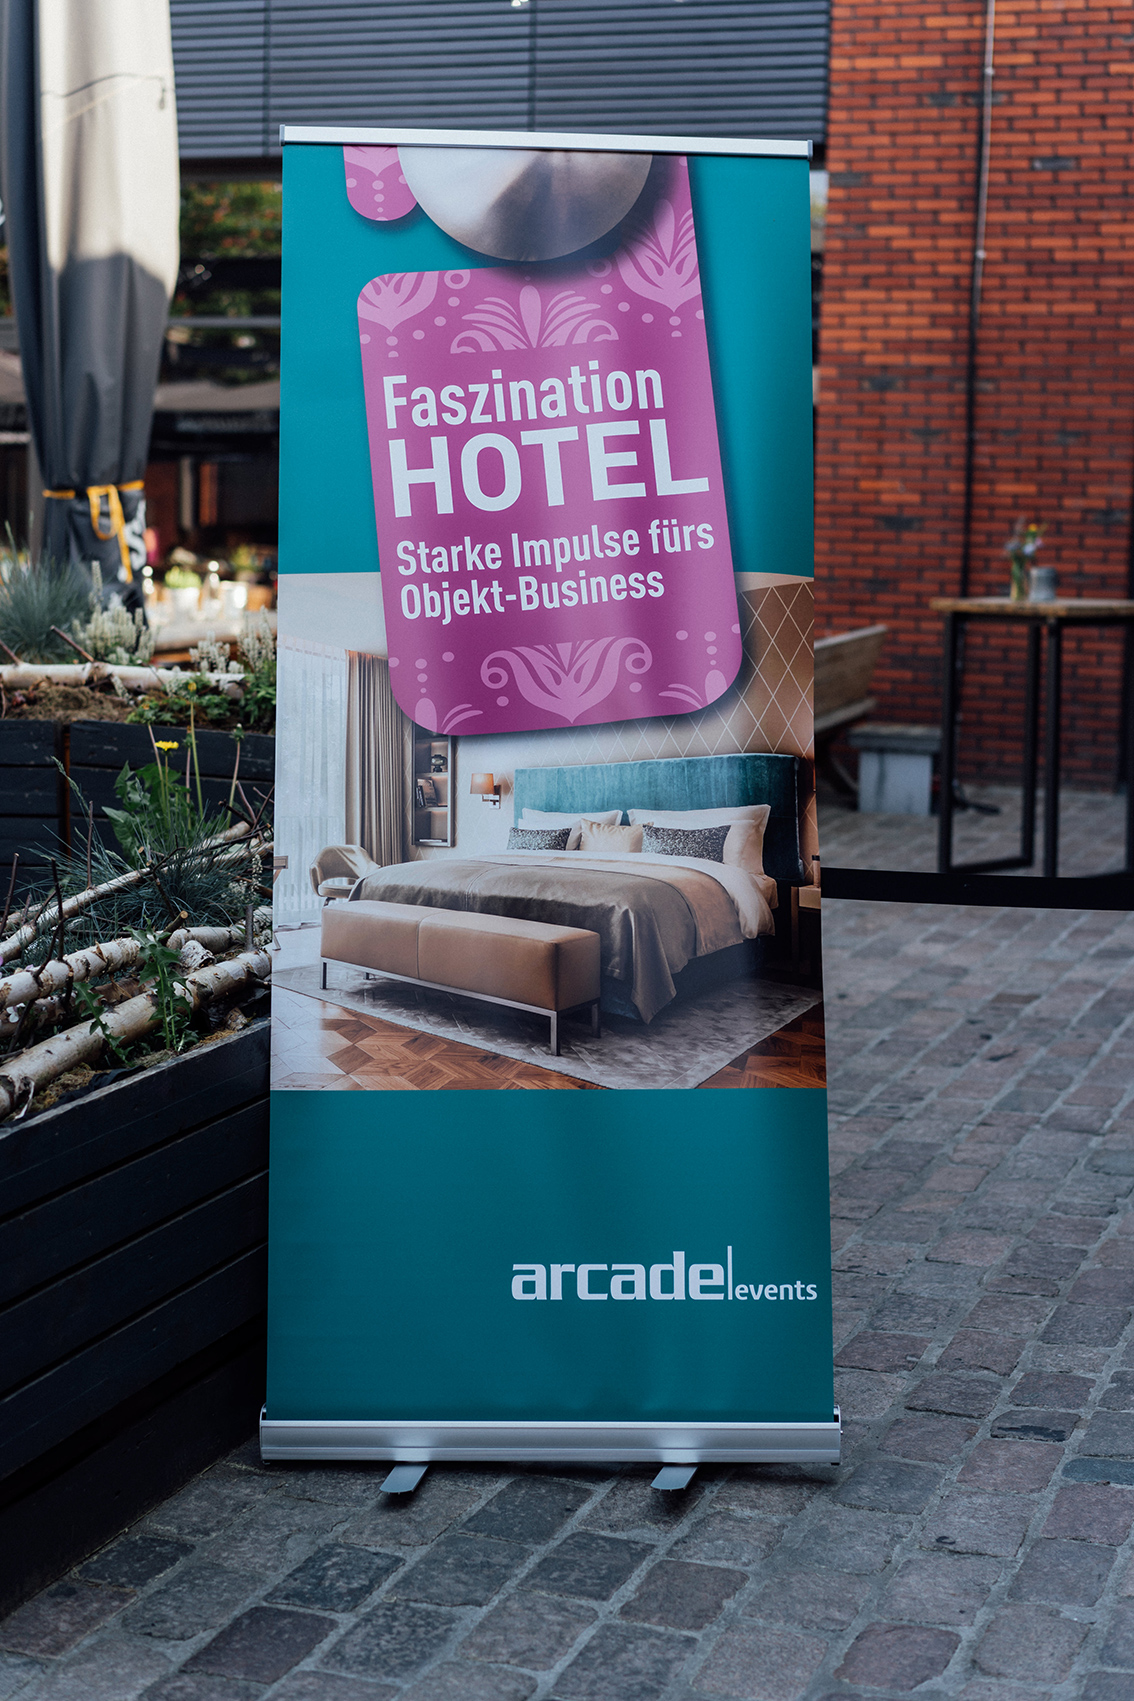 Arcade-event---faszination-hotel-5